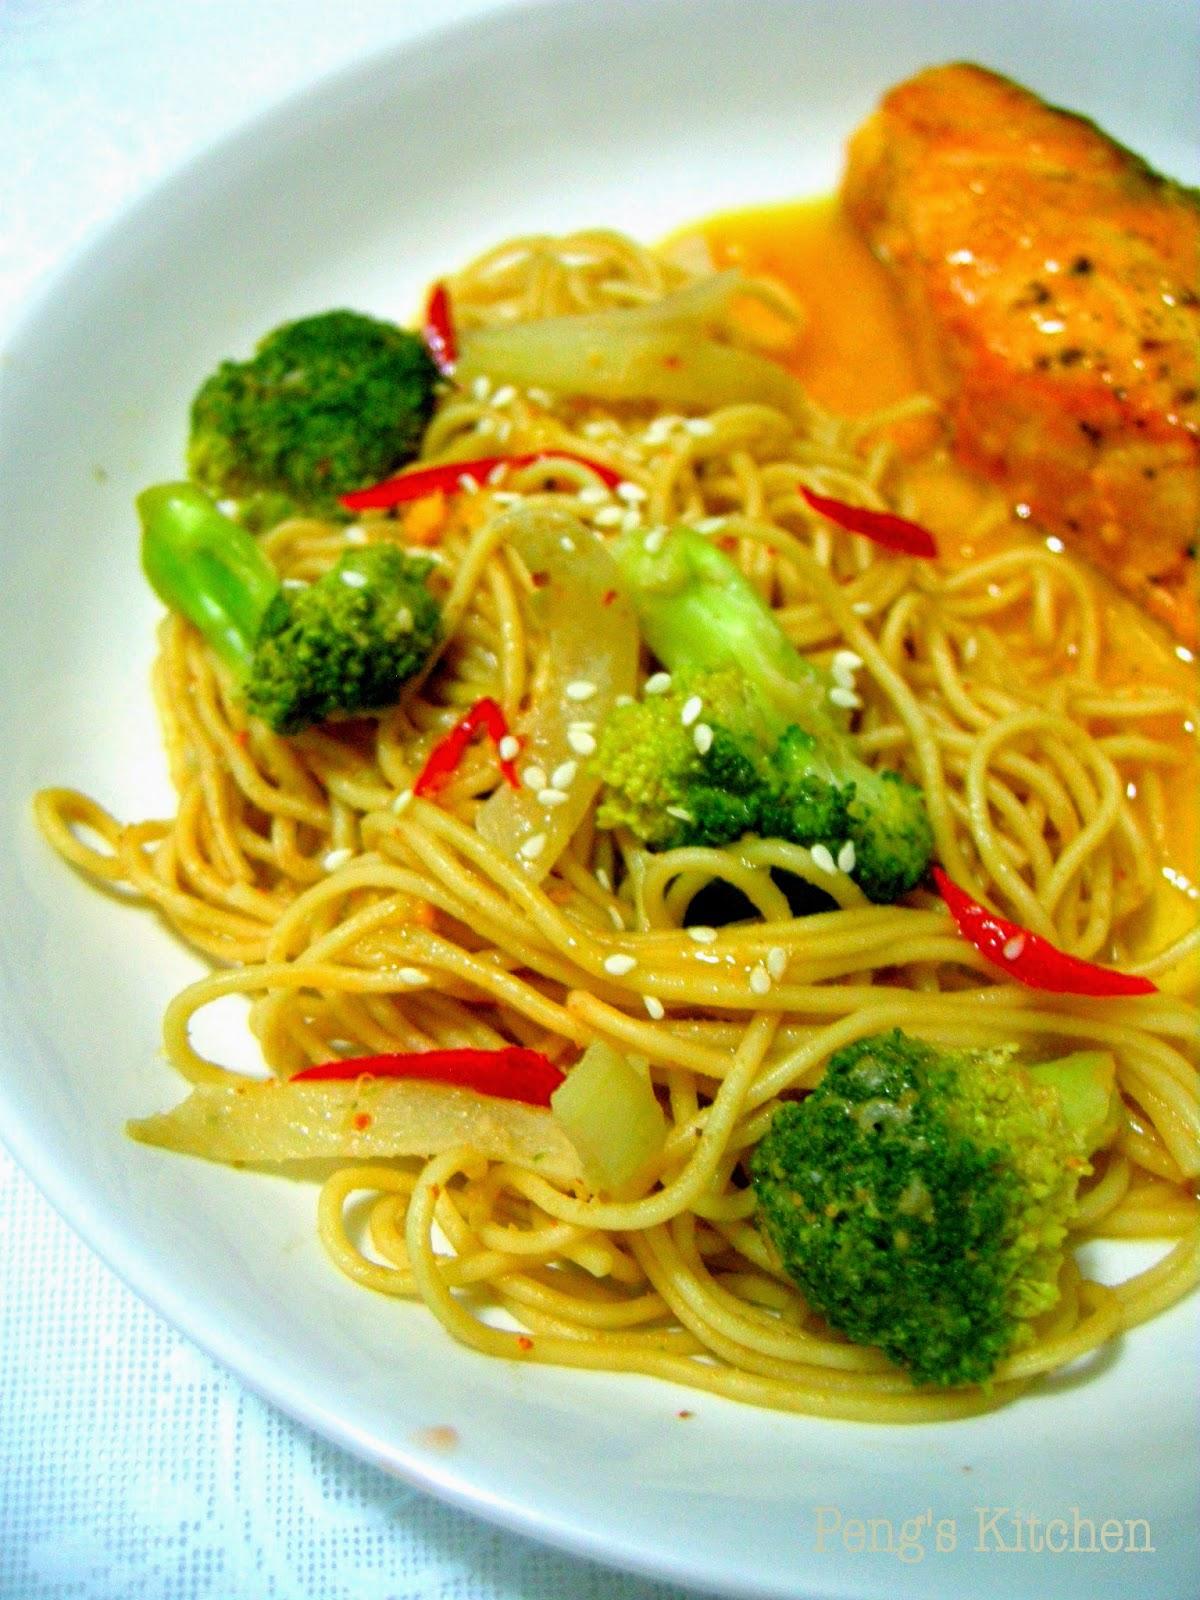 Peng's Kitchen: Orange & Soy Glazed Salmon with Light Sesame Noodles